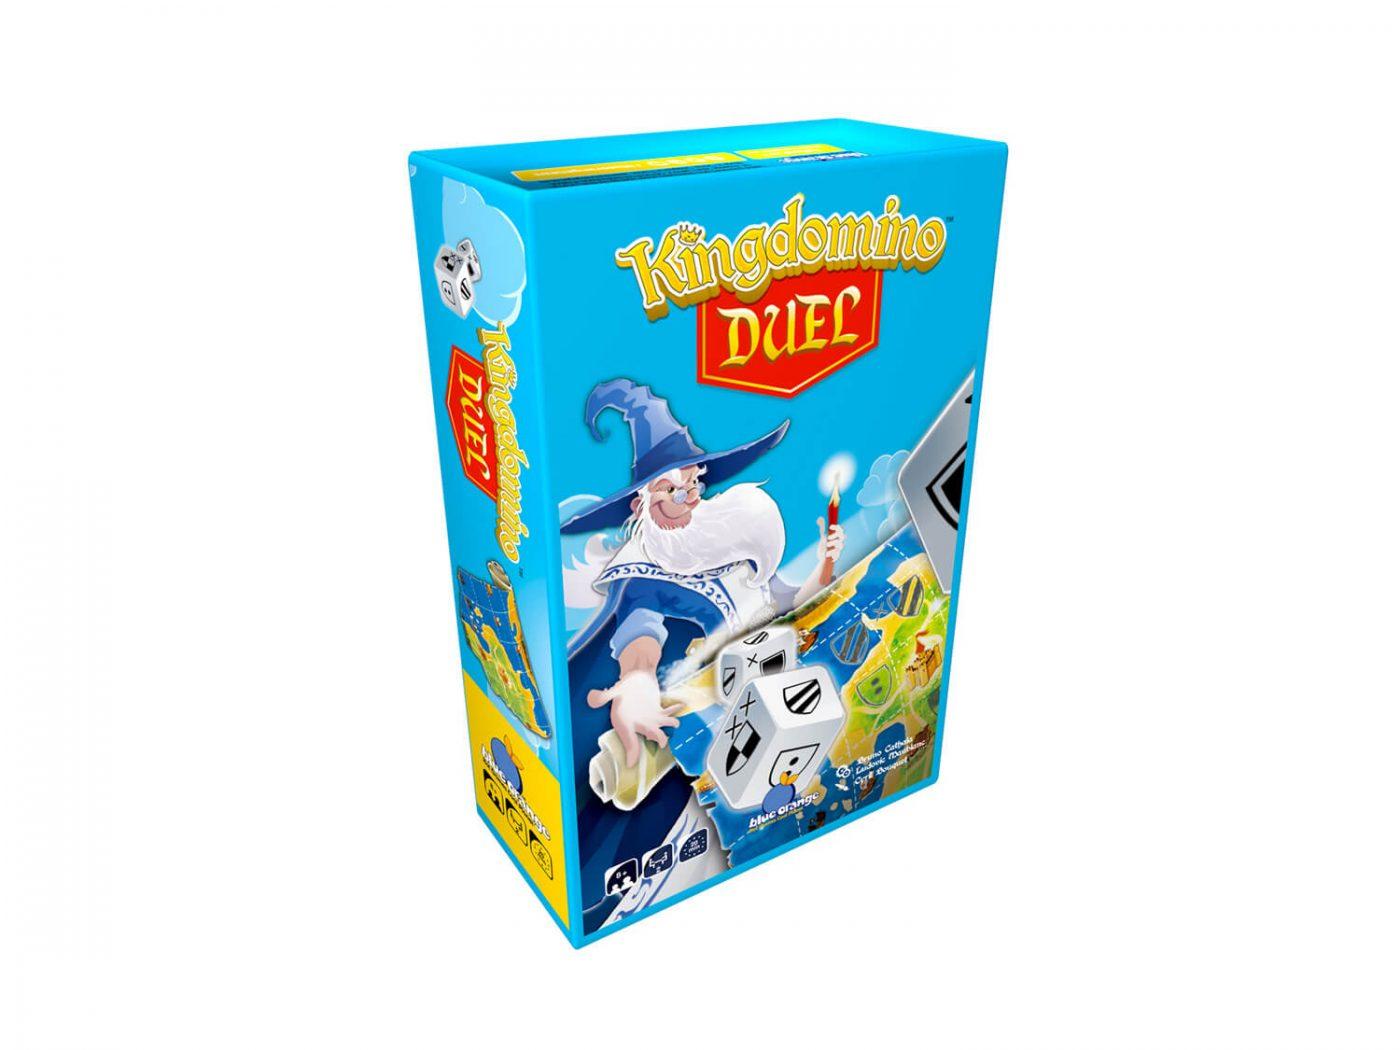 Kingdomino Duel jeu